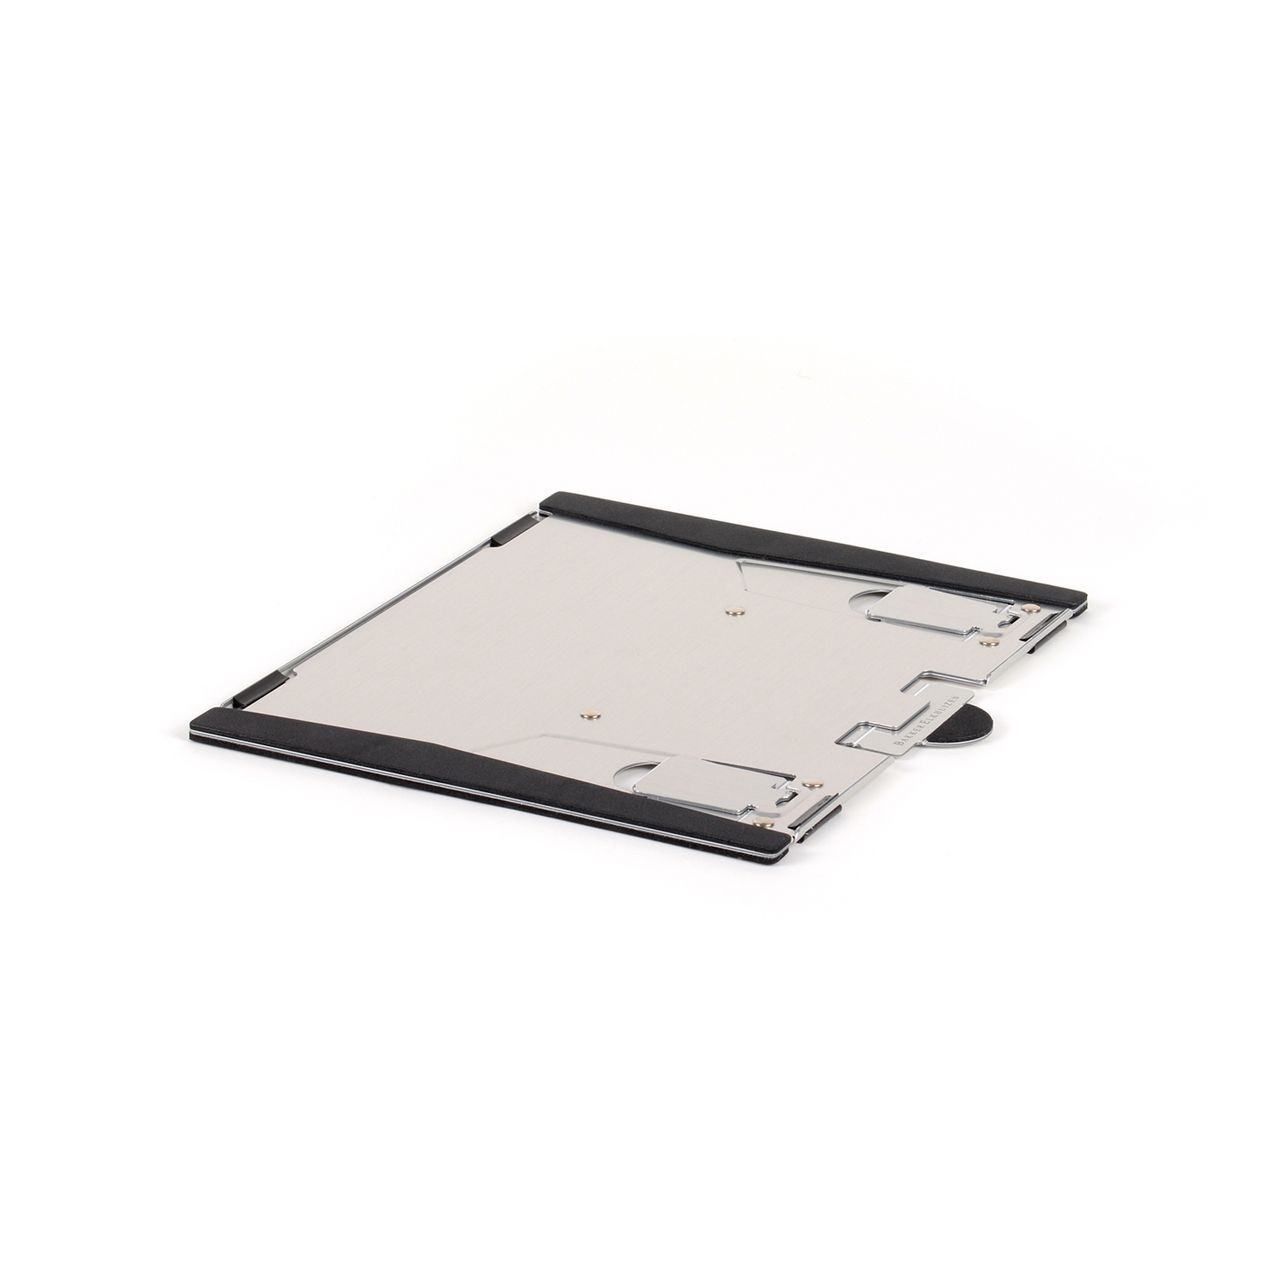 flextop mini laptophouder ERKAFTO31 ingevouwen